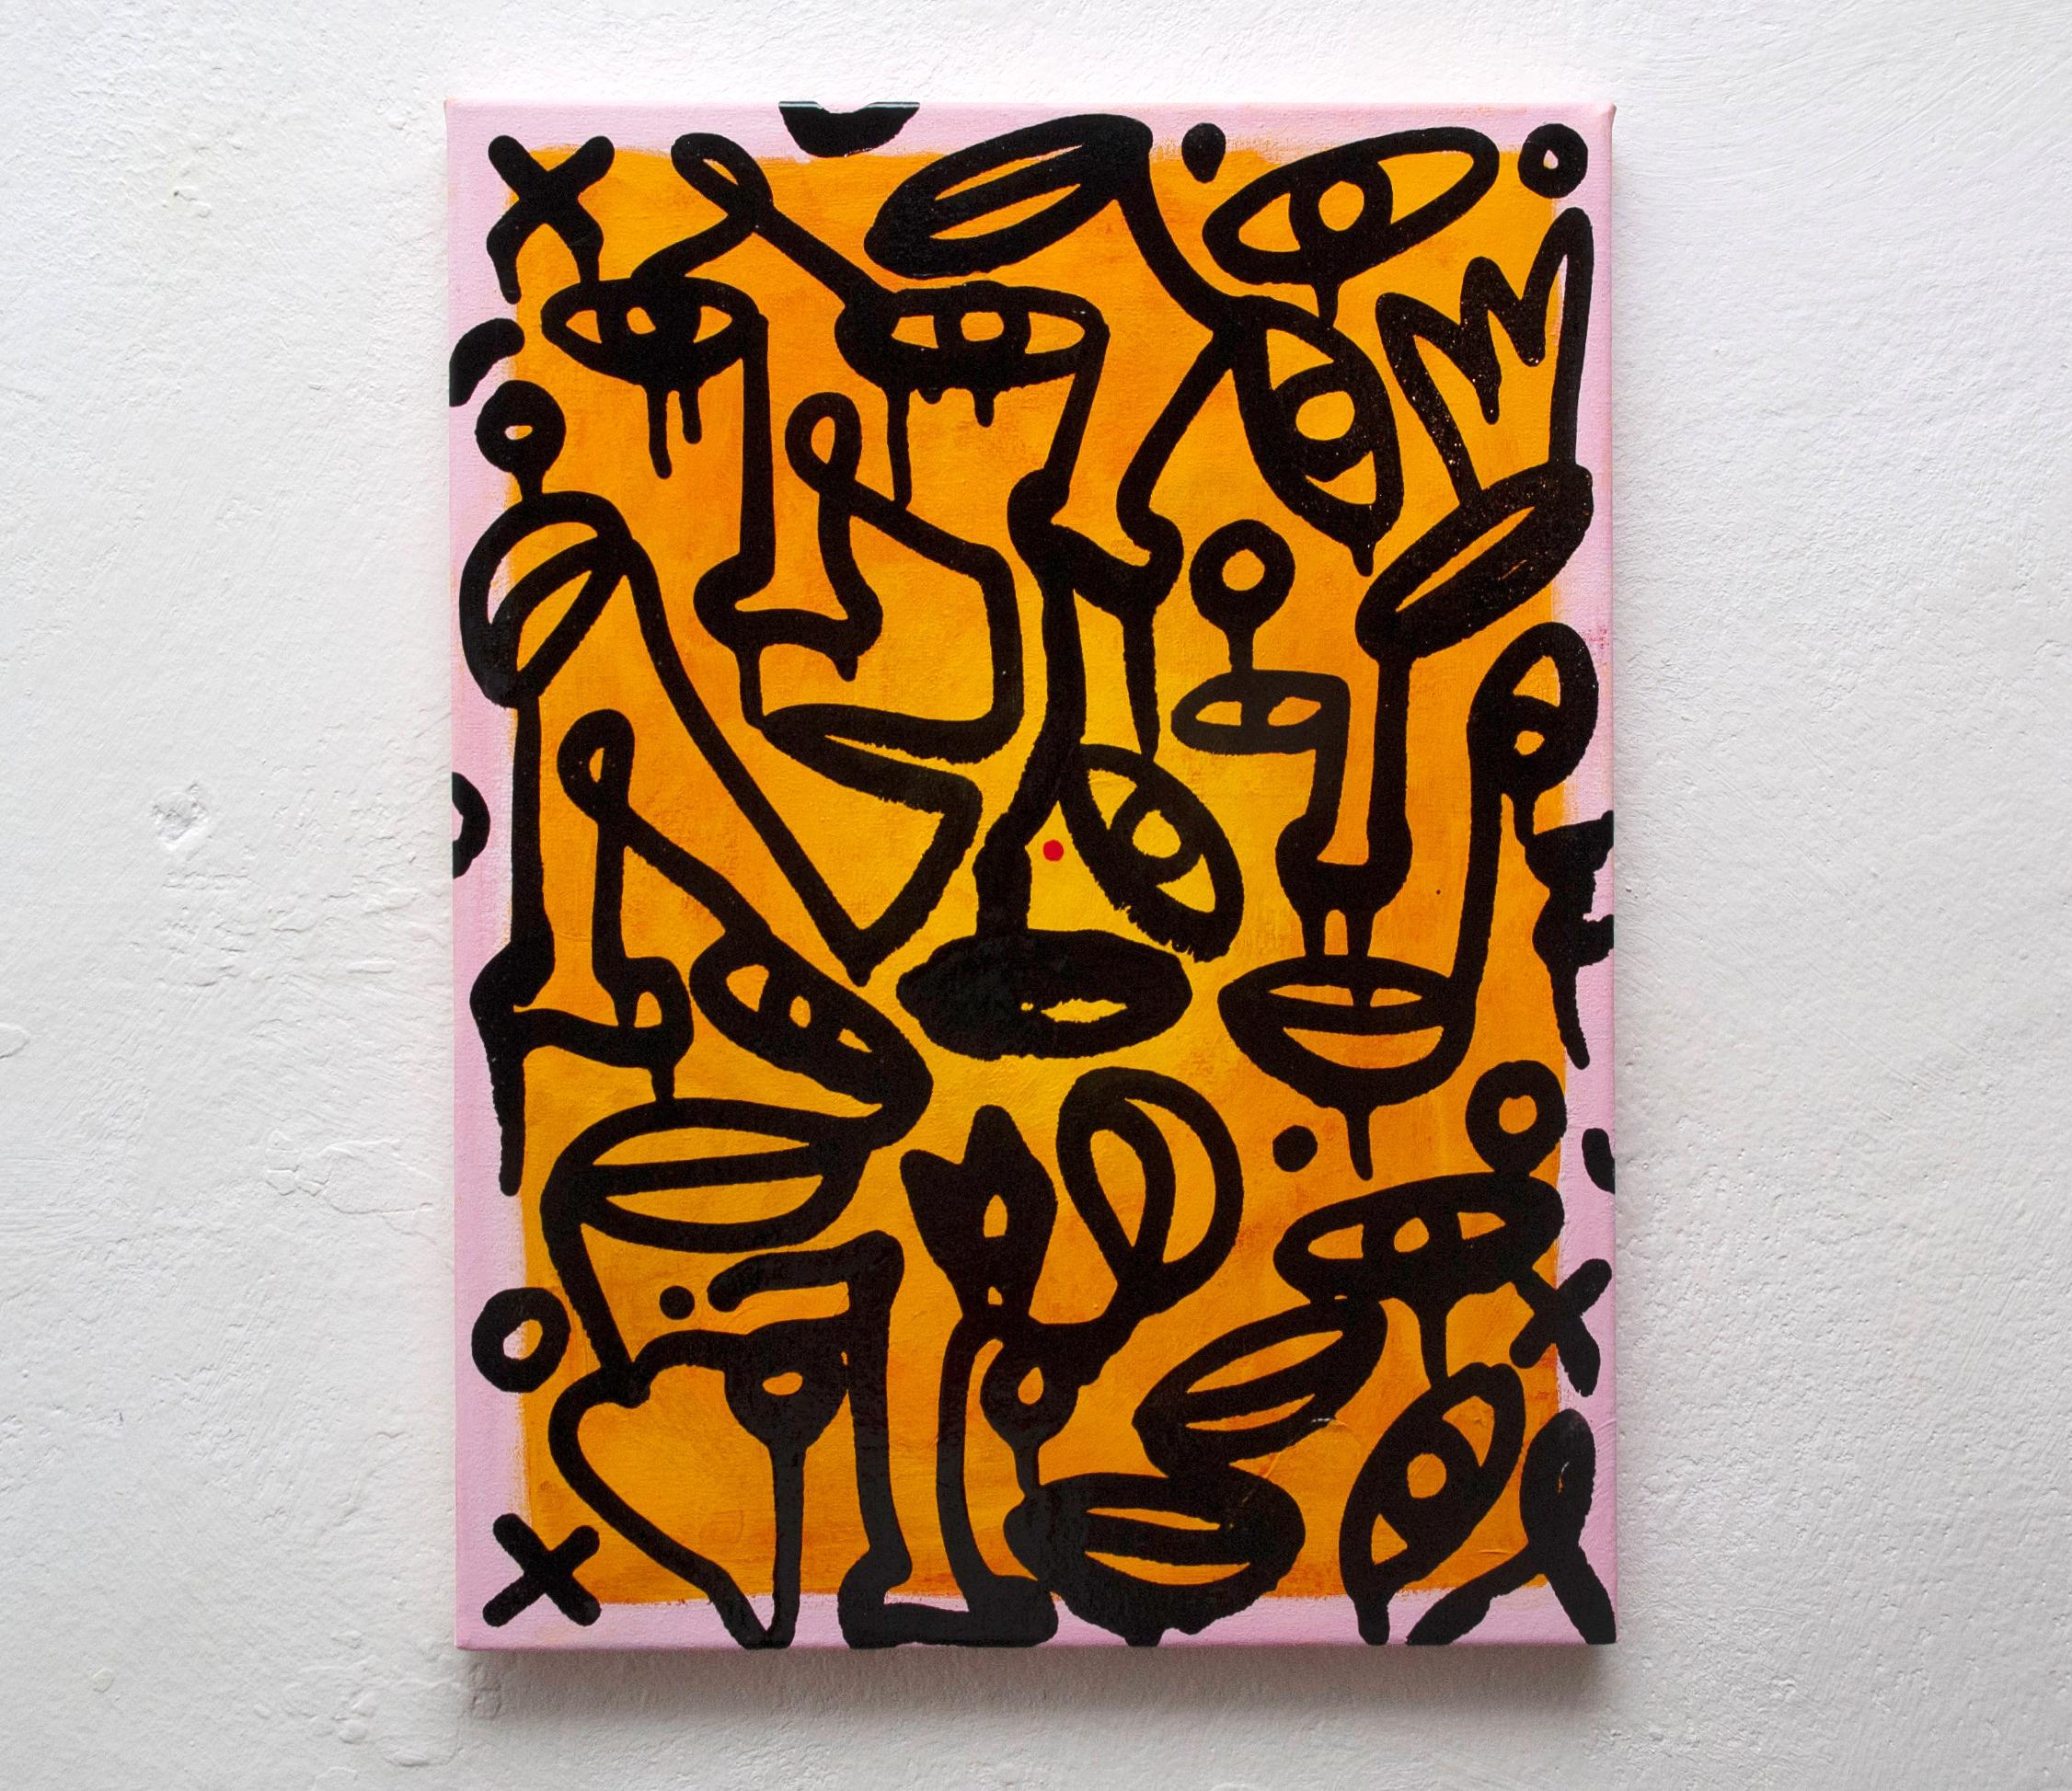 Light Fire Dreams Burn - contemporary Ukrainian art - monoline faces on bright yellow